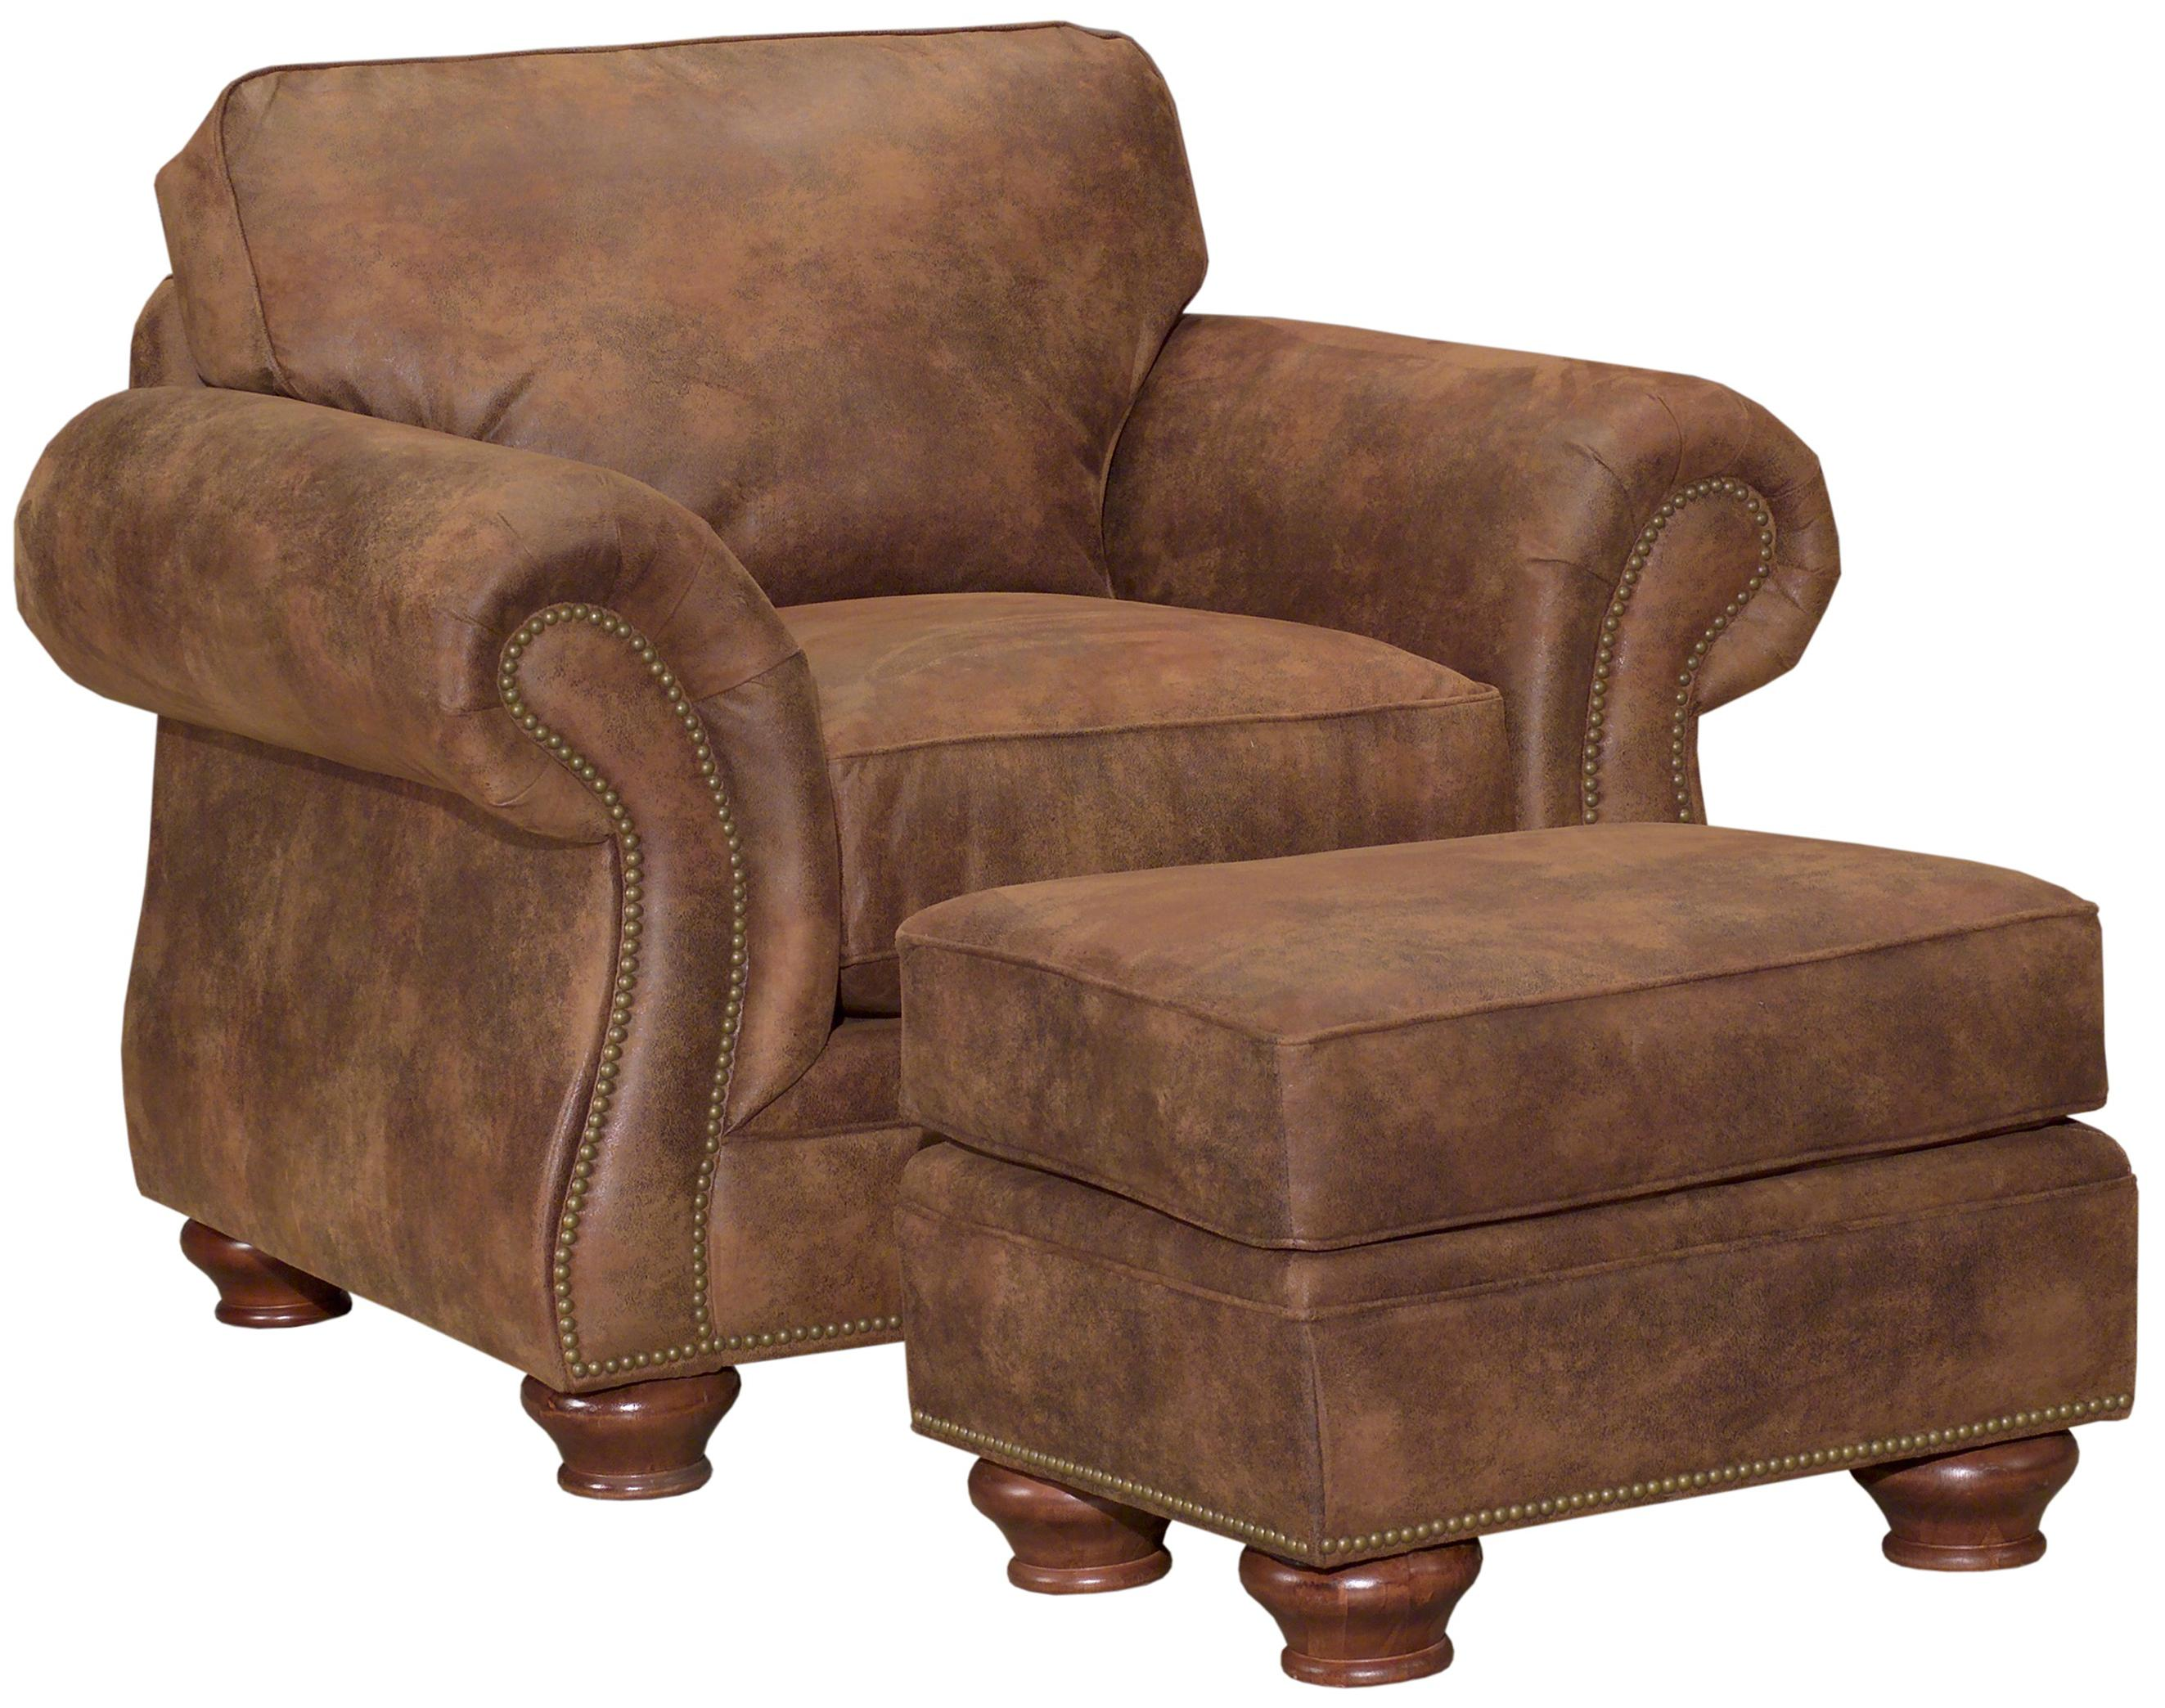 Merveilleux Broyhill Furniture Laramie Chair And Ottoman Set   Item Number: 5081 0+5